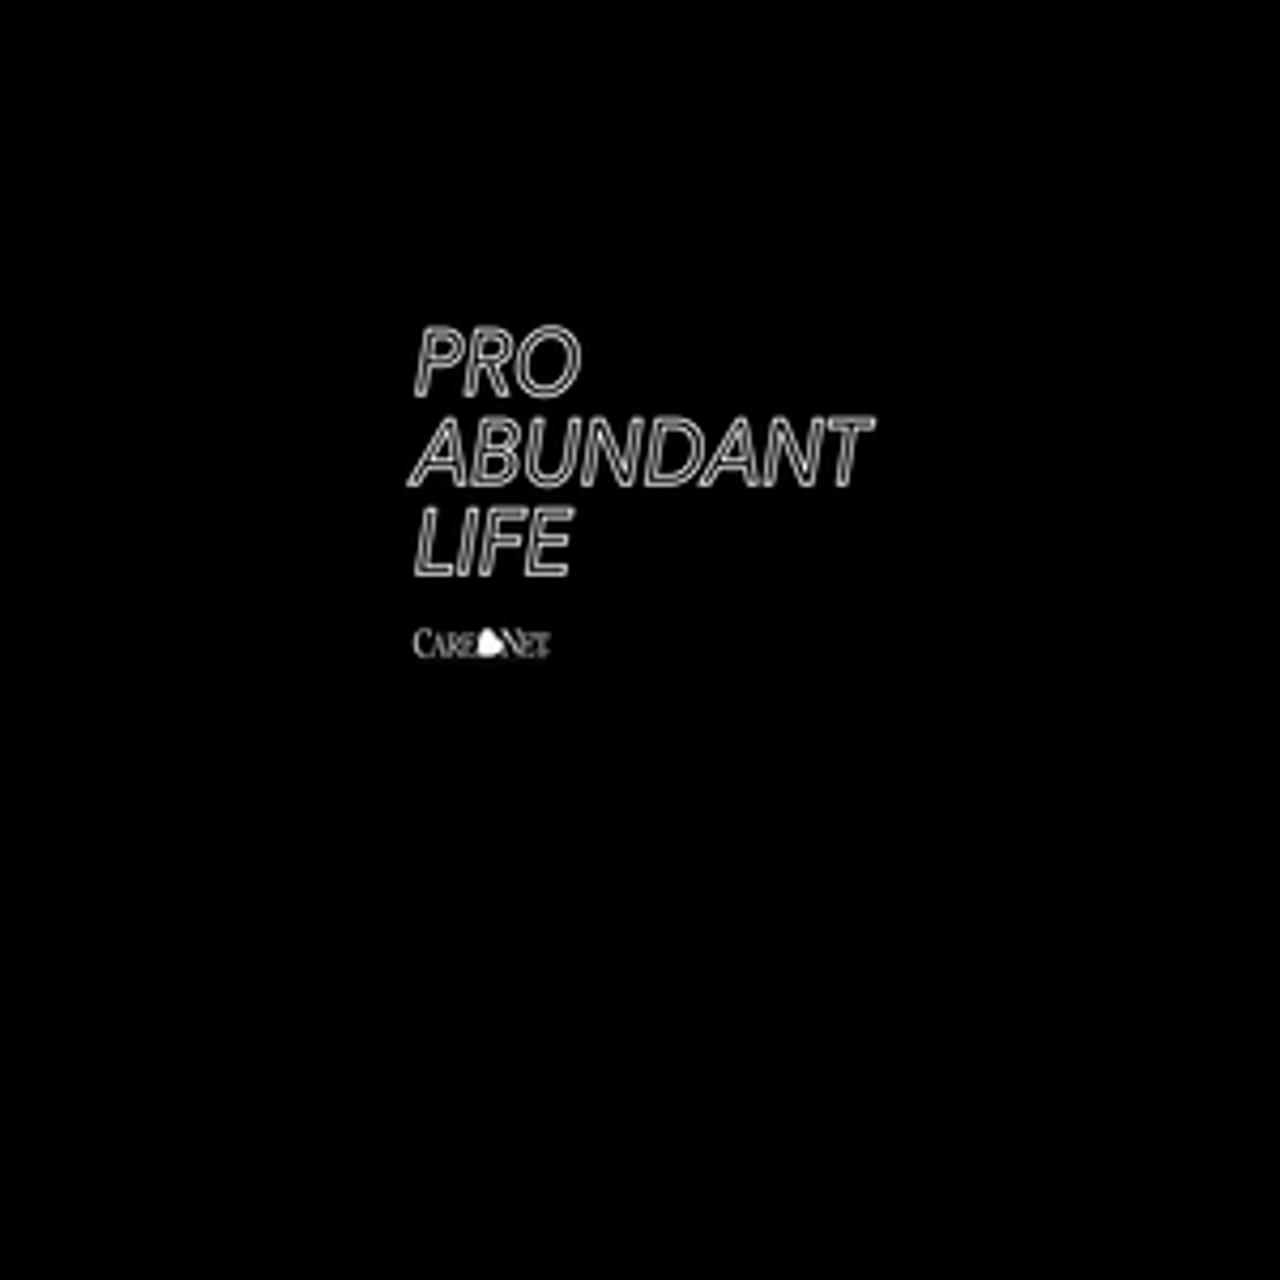 Pro-Abundant Life T-Shirt V-Neck